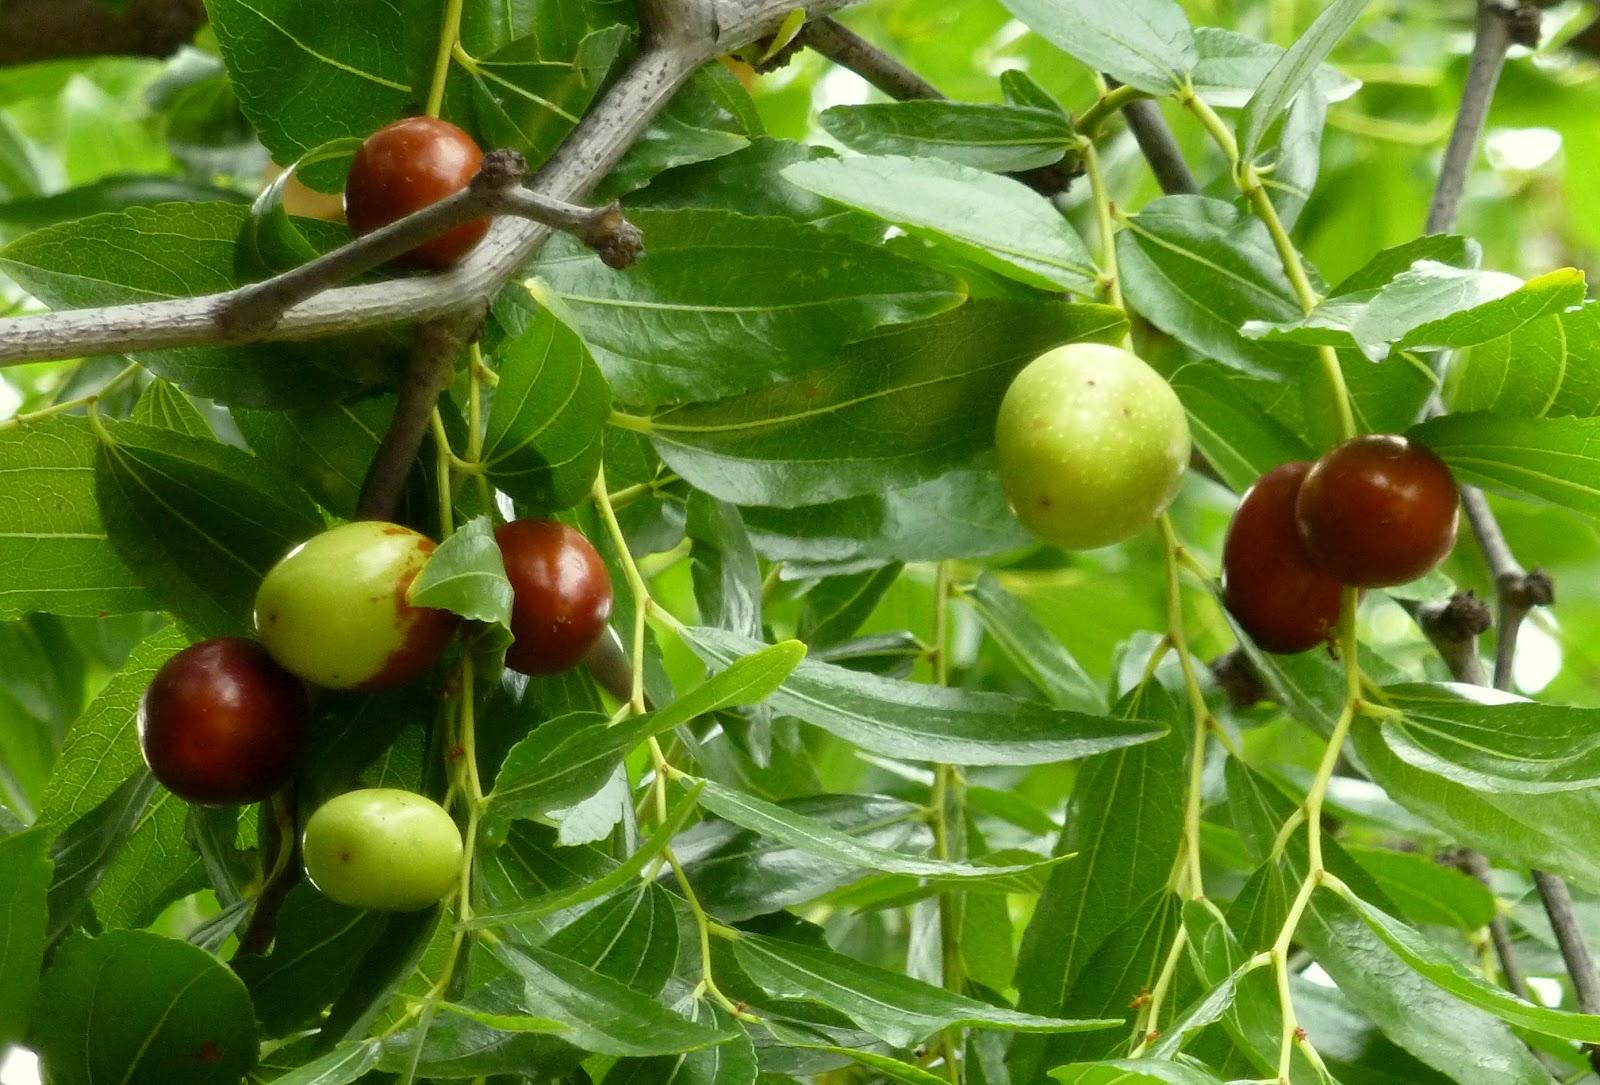 Imagenes Animadas De Arboles De Mango: Árboles Con Alma: Jinjolero. Azufaifo. Ginjoler. (Zizyphus